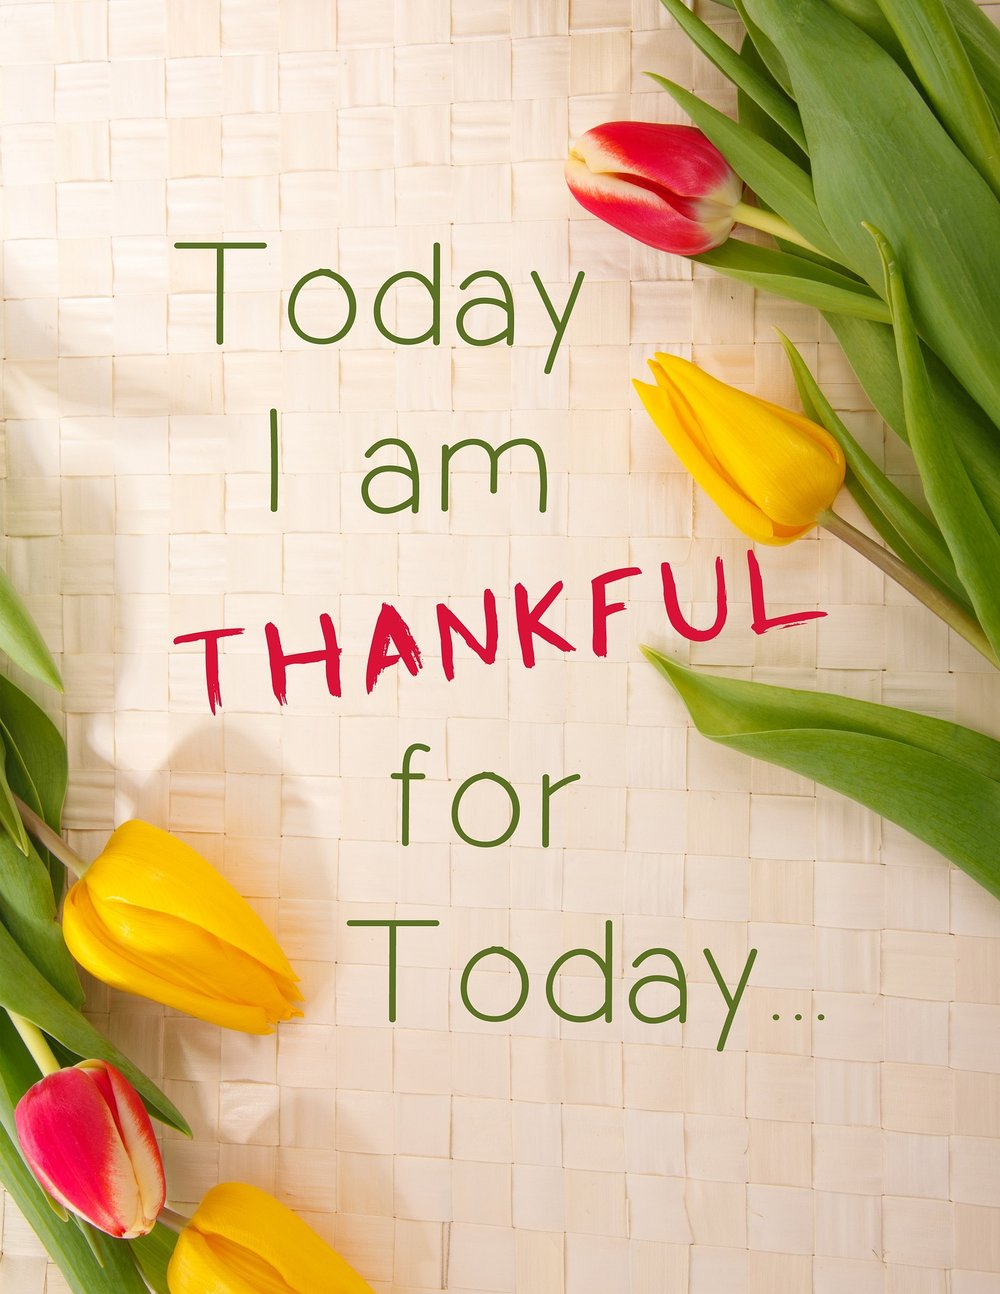 thankful-1081614_1920.jpg